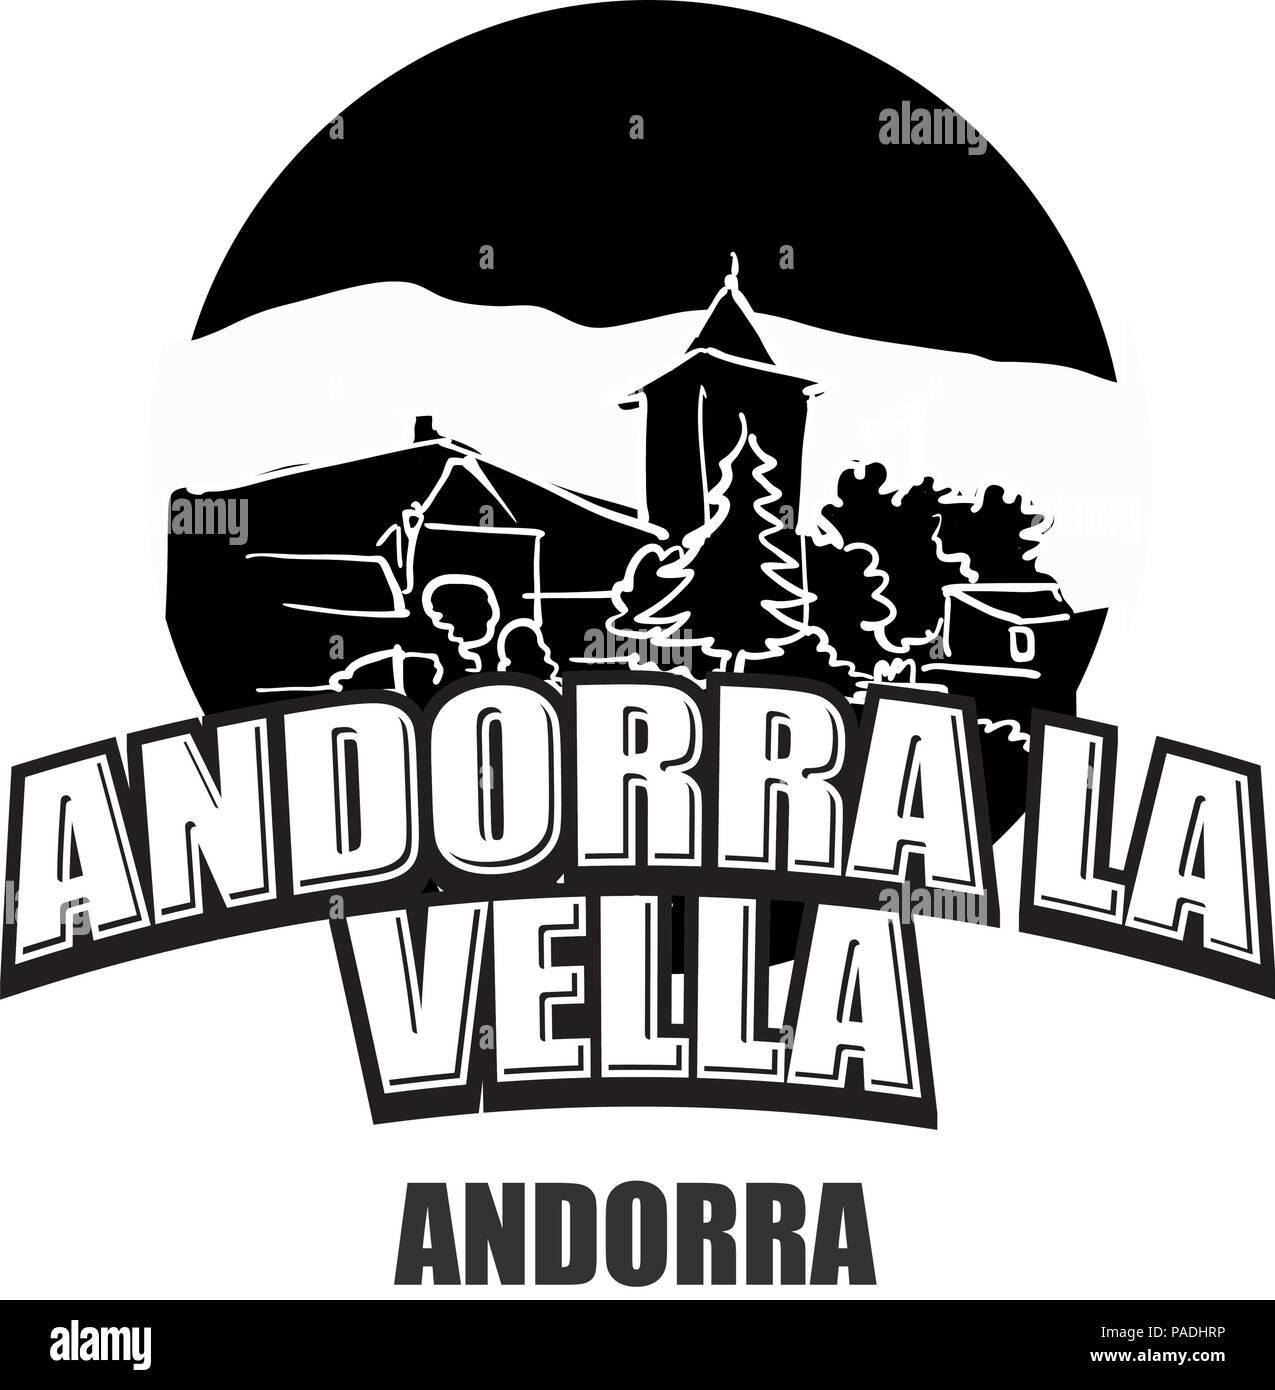 Andorra la Vella black and white logo for high quality prints. Hand drawn vector sketch. Stock Vector